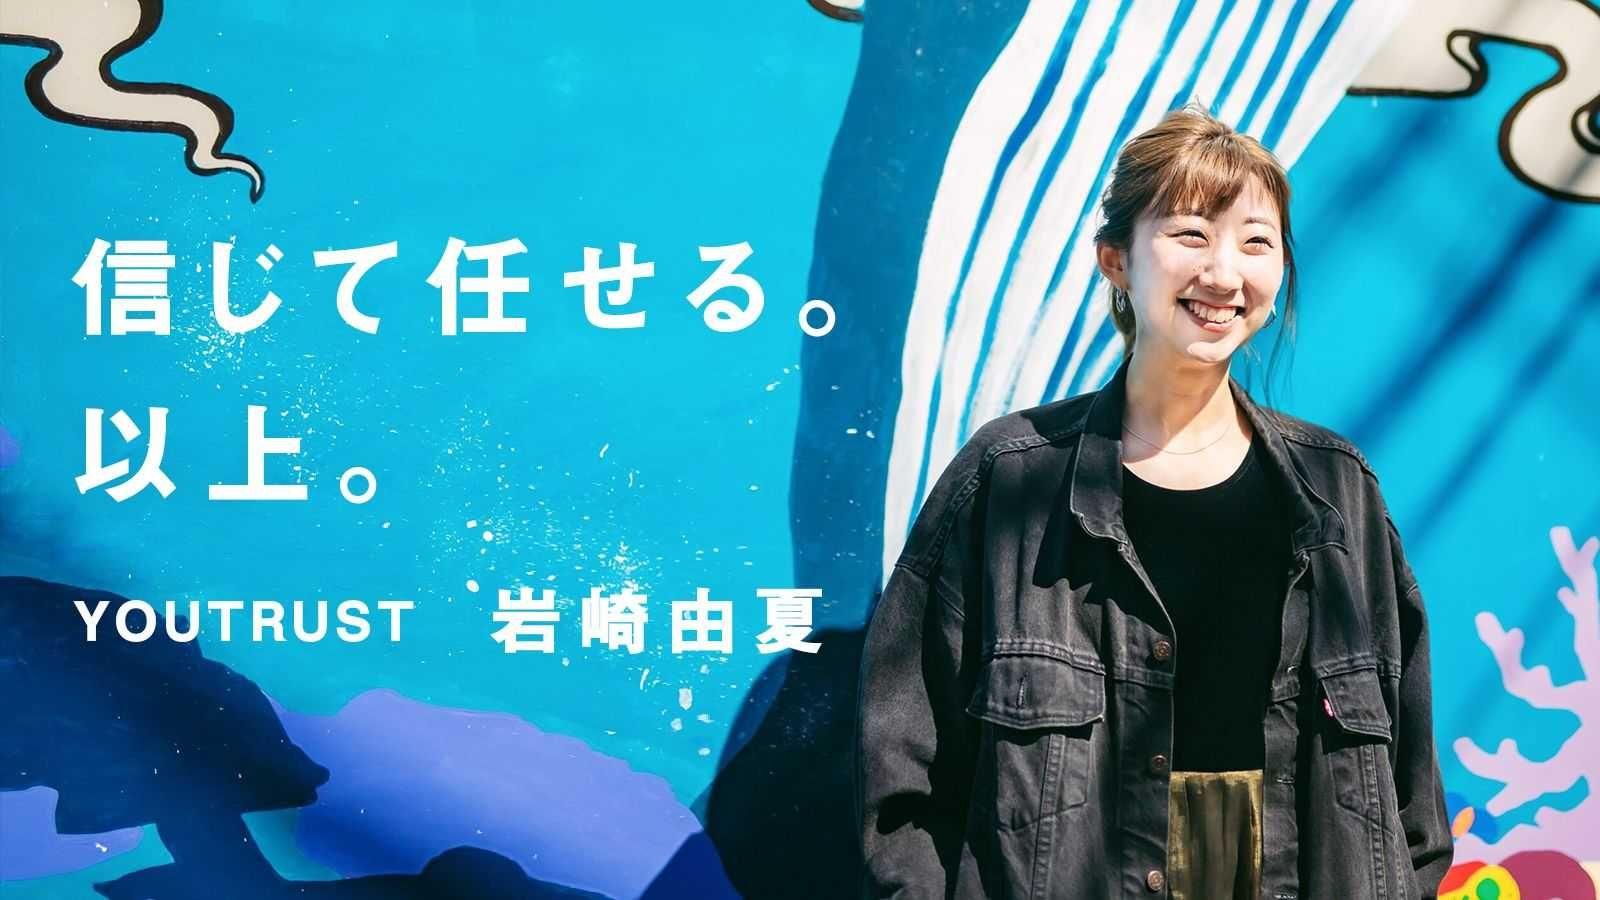 YOUTRUST岩崎由夏|リリース1周年。心が折れかけた時、そこには仲間がいた。